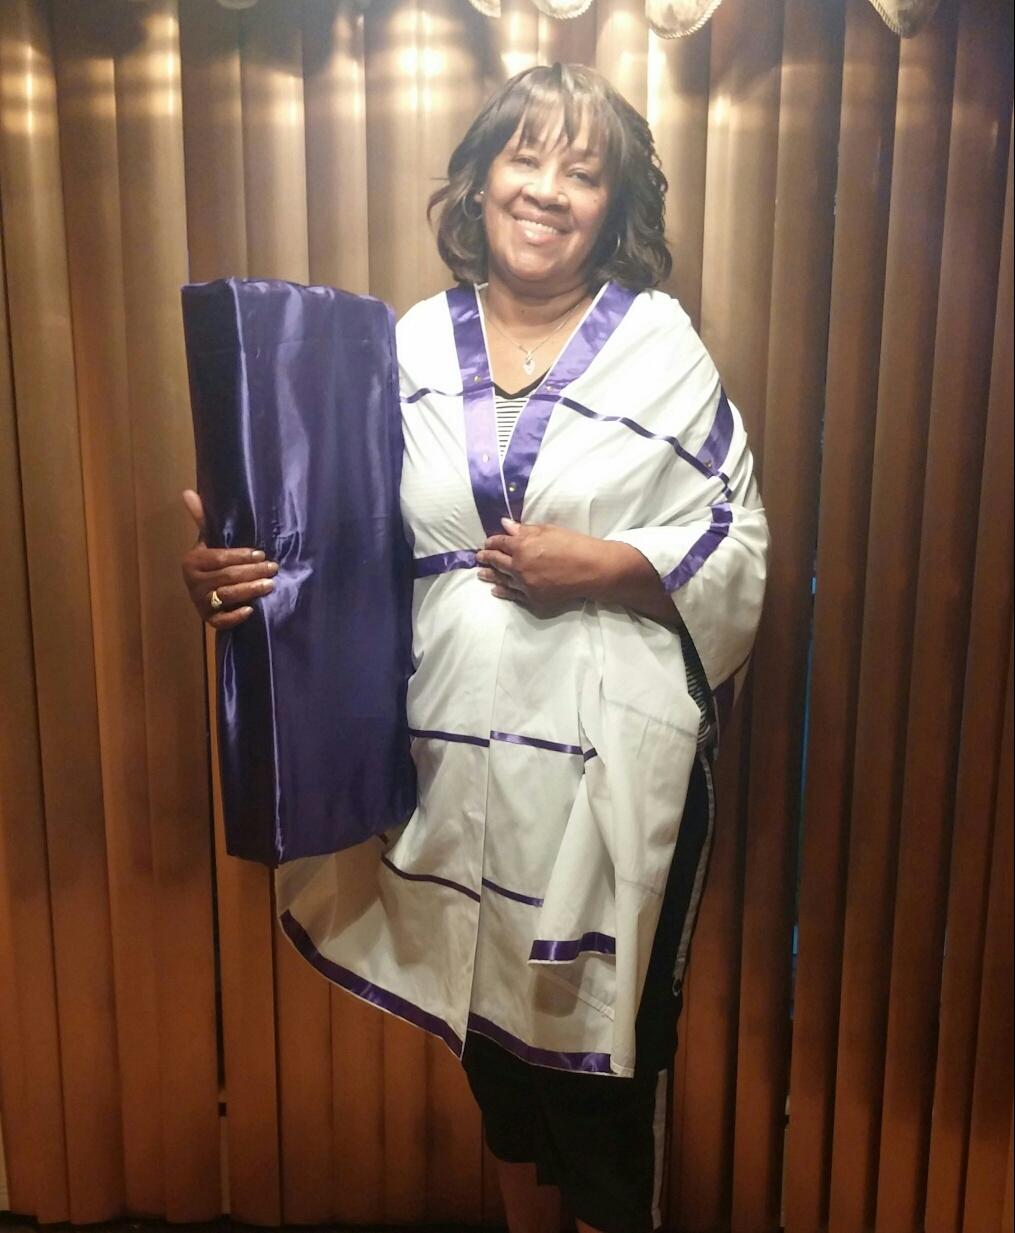 Prayer Shawl W/ Pillow & Bible Scriptures